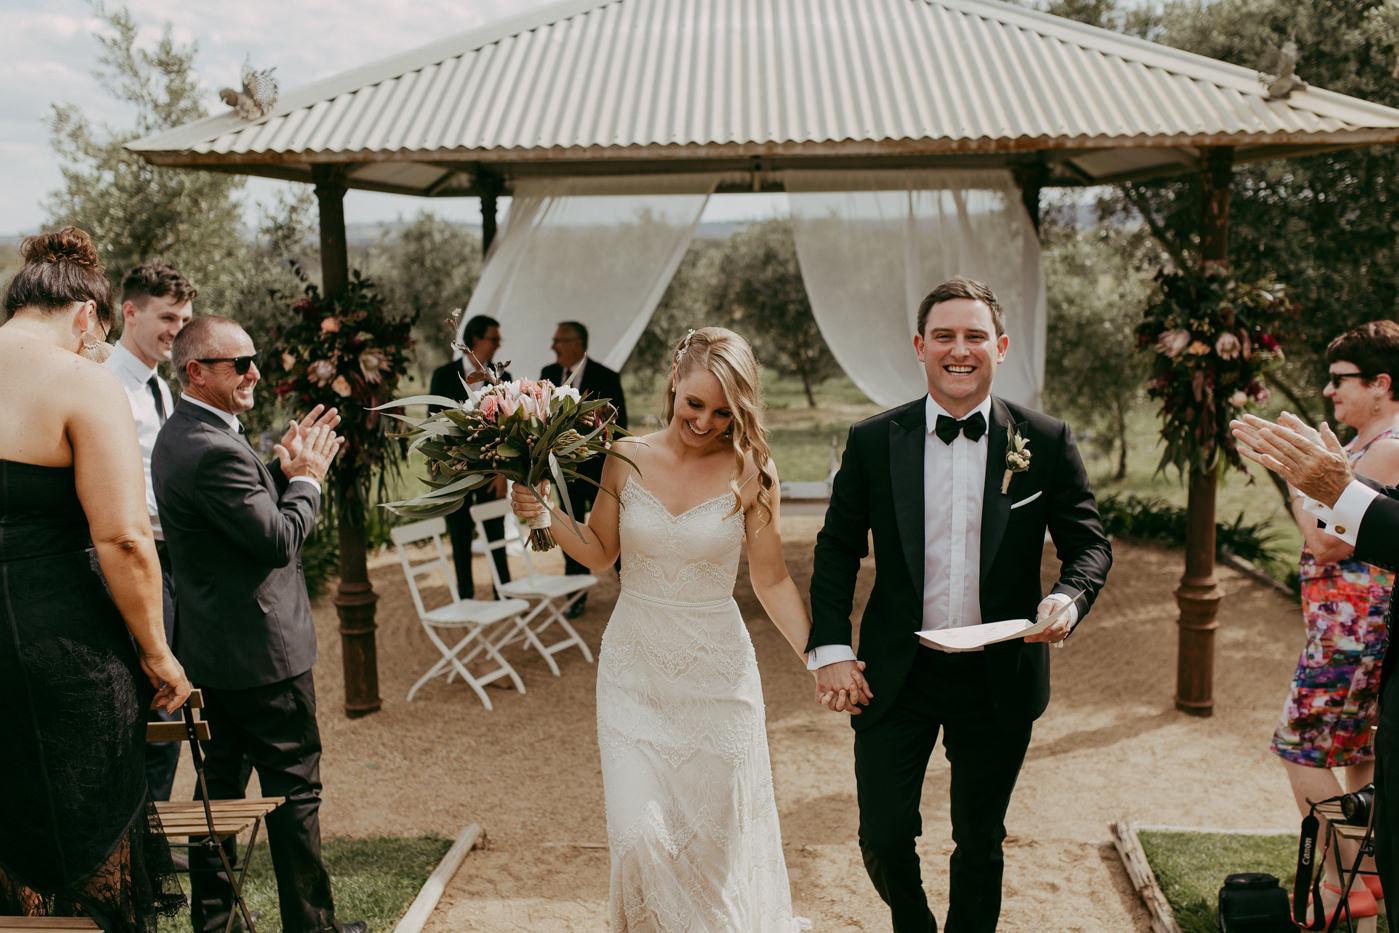 Anthony & Eliet - Wagga Wagga Wedding - Country NSW - Samantha Heather Photography-110.jpg